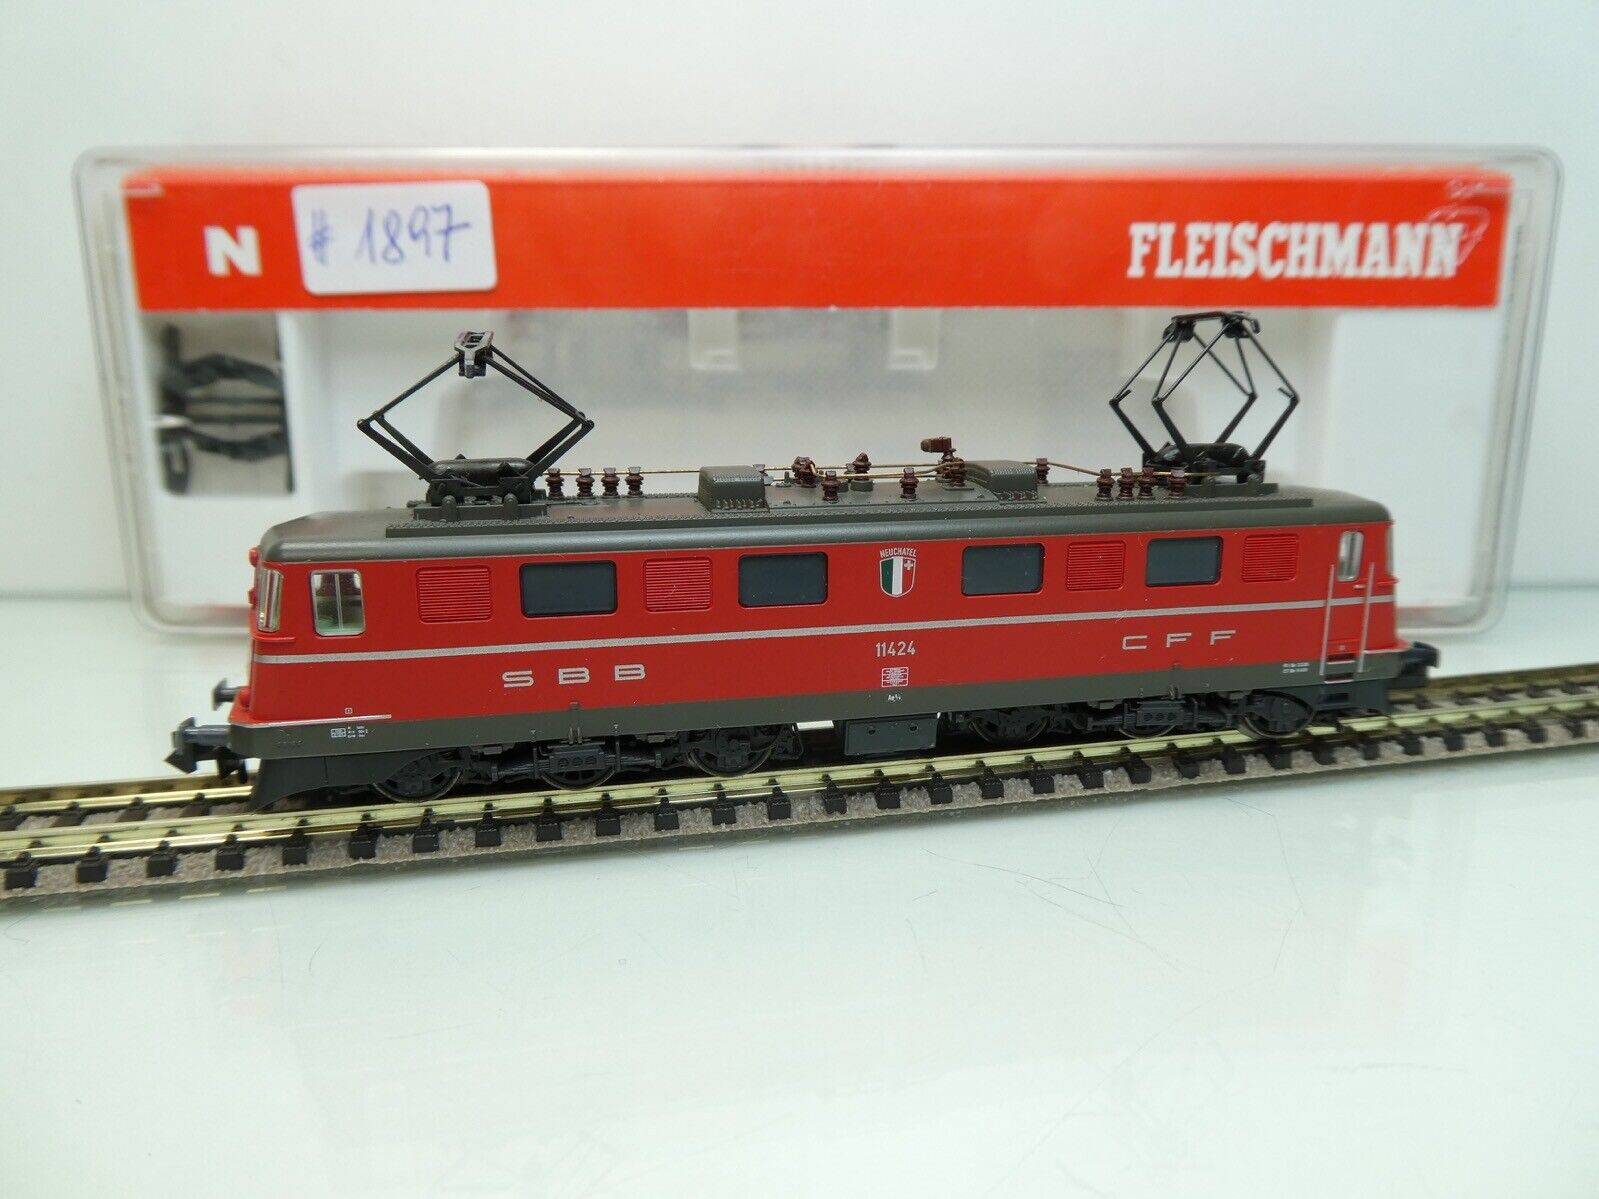 marca famosa Fleischmann 737205 737205 737205 - Spur N - SBB CFF - E-Lok 11424 - NEUCHATEL - OVP -  1897  el mas reciente